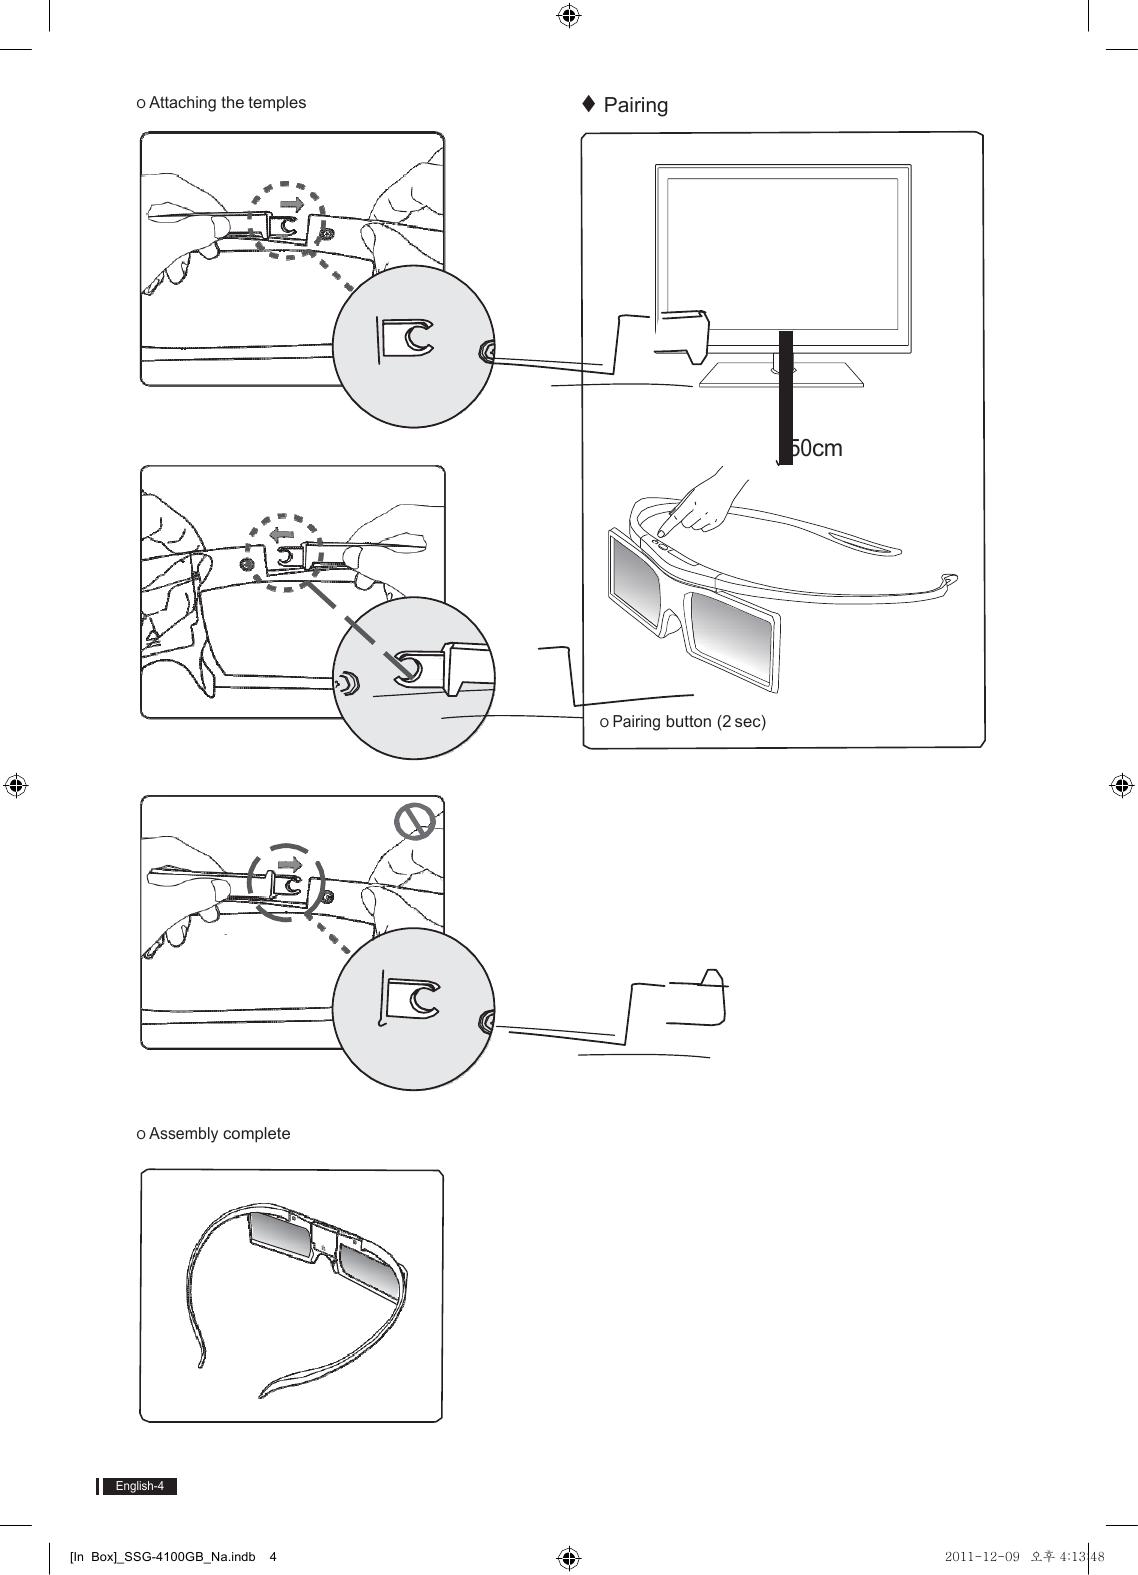 Samsung 3d glasses manual pdf